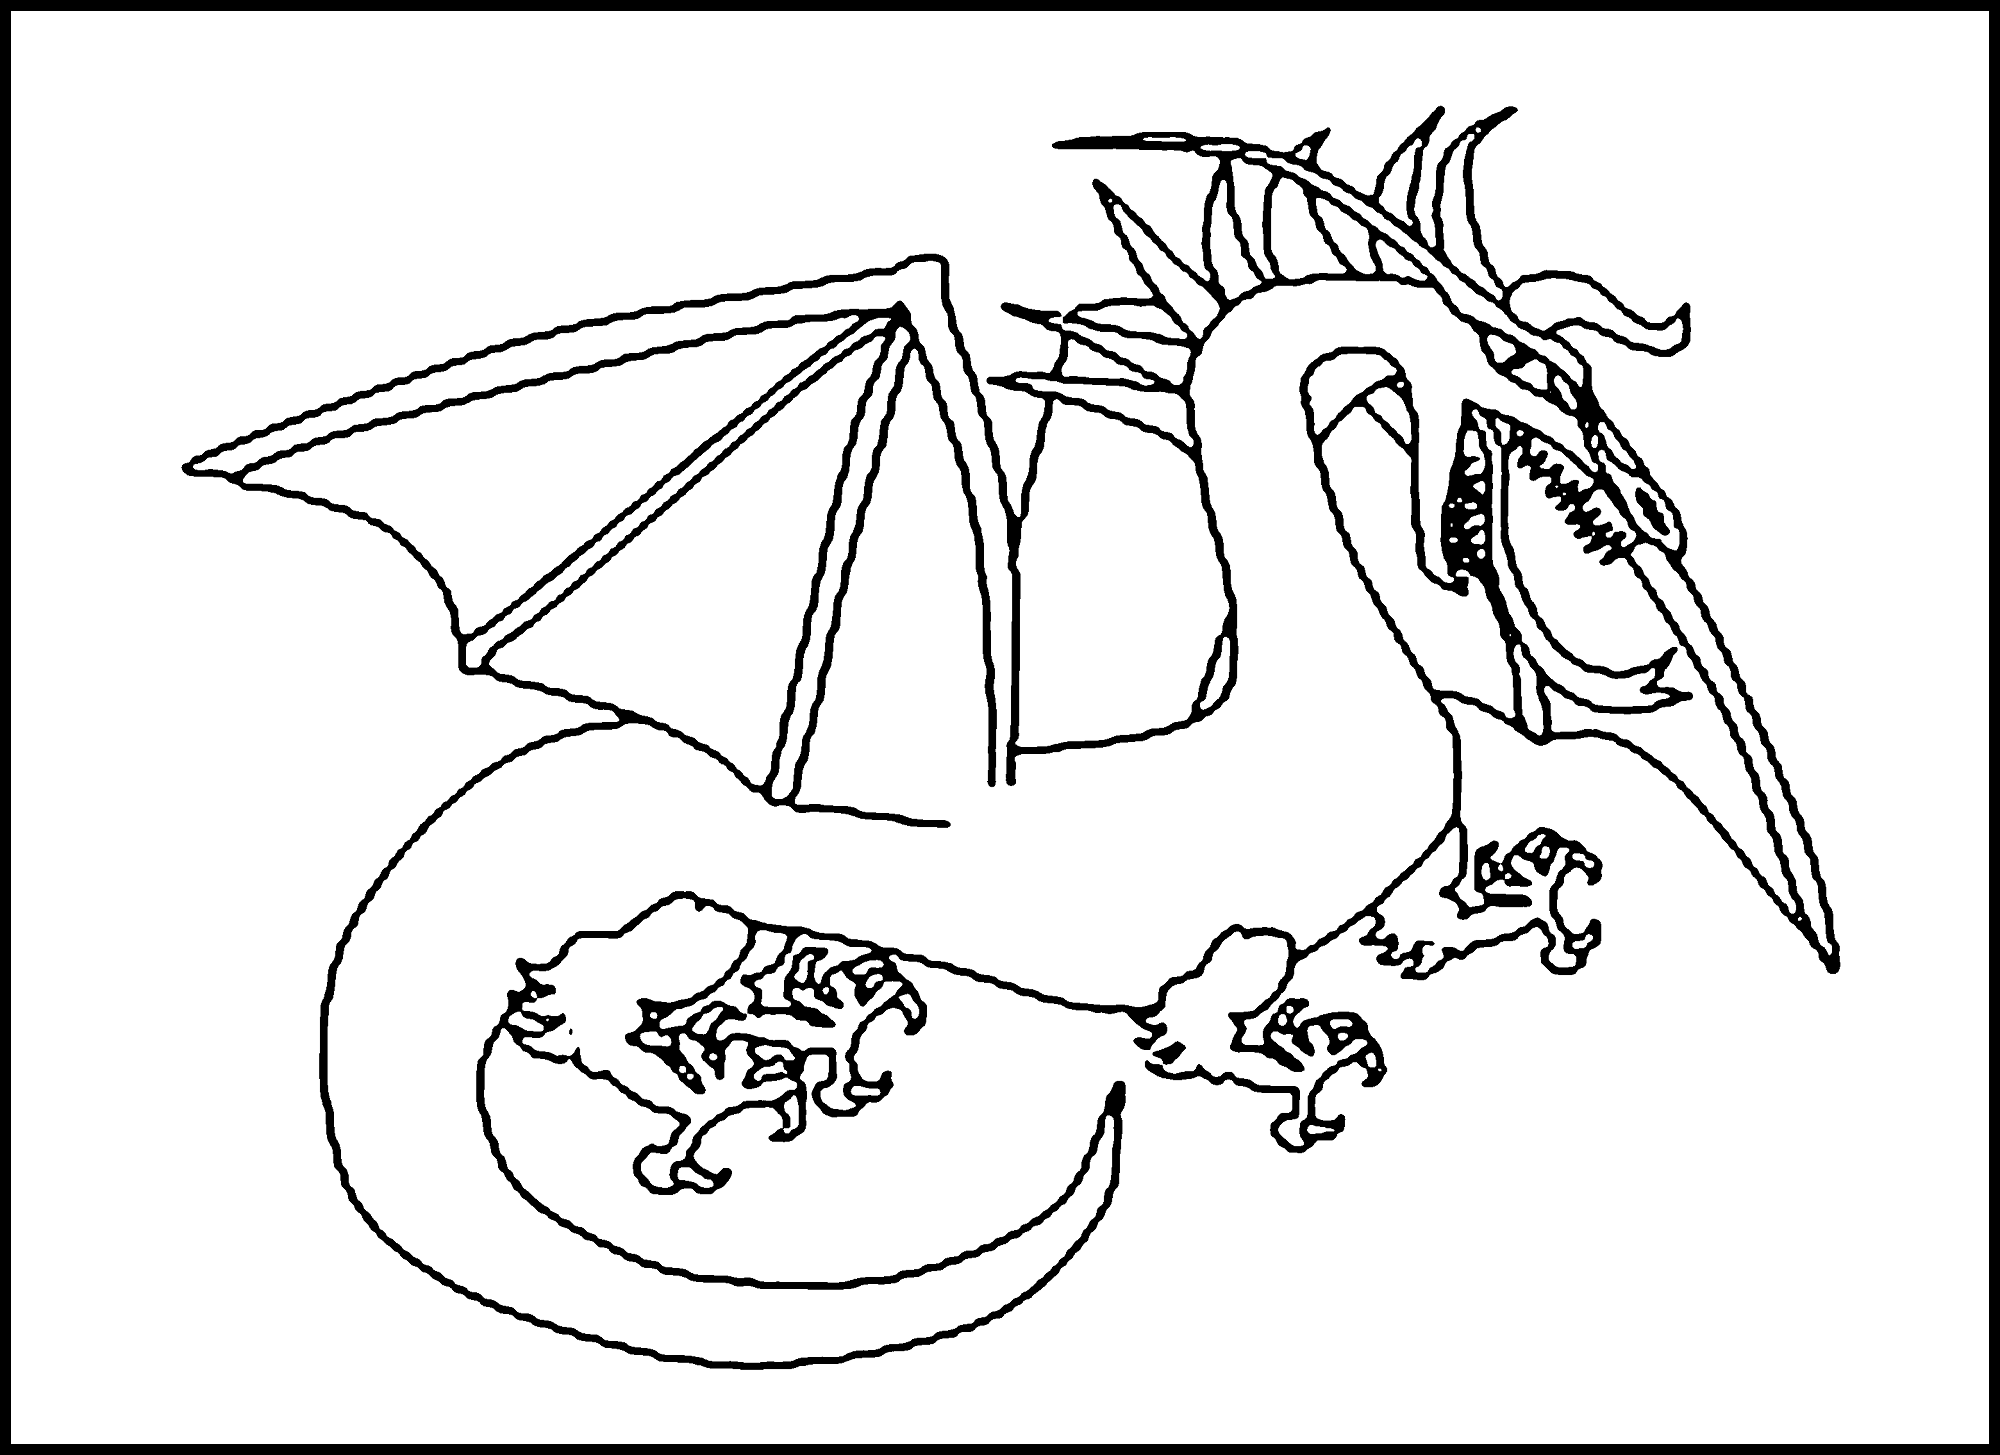 coloring page dragon top 25 free printable dragon coloring pages online dragon coloring page